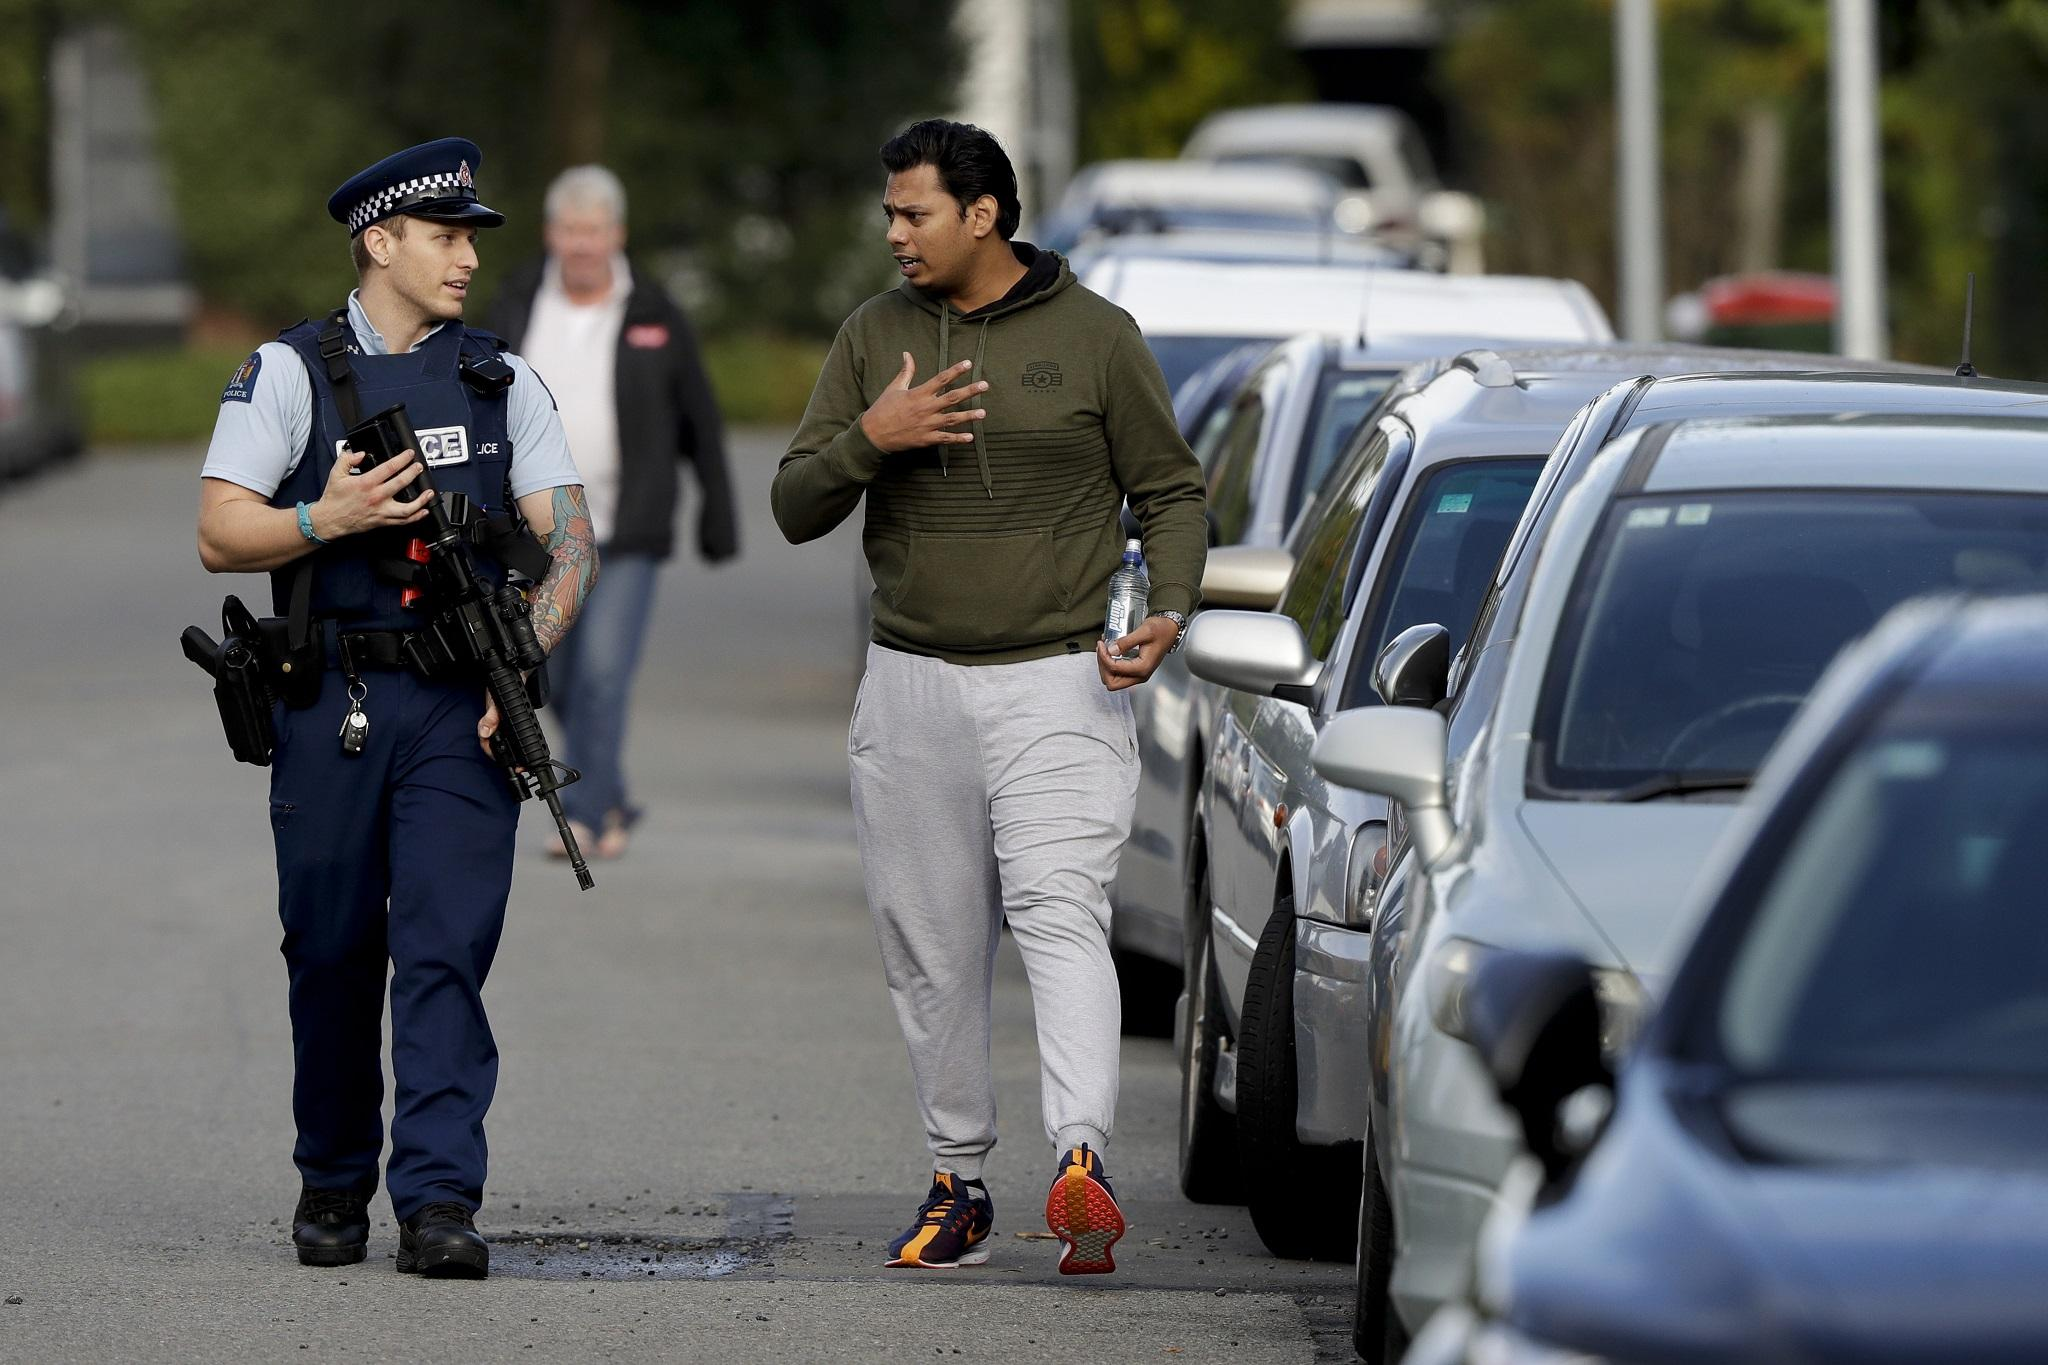 New Zealand shooting suspect 'complains about prison